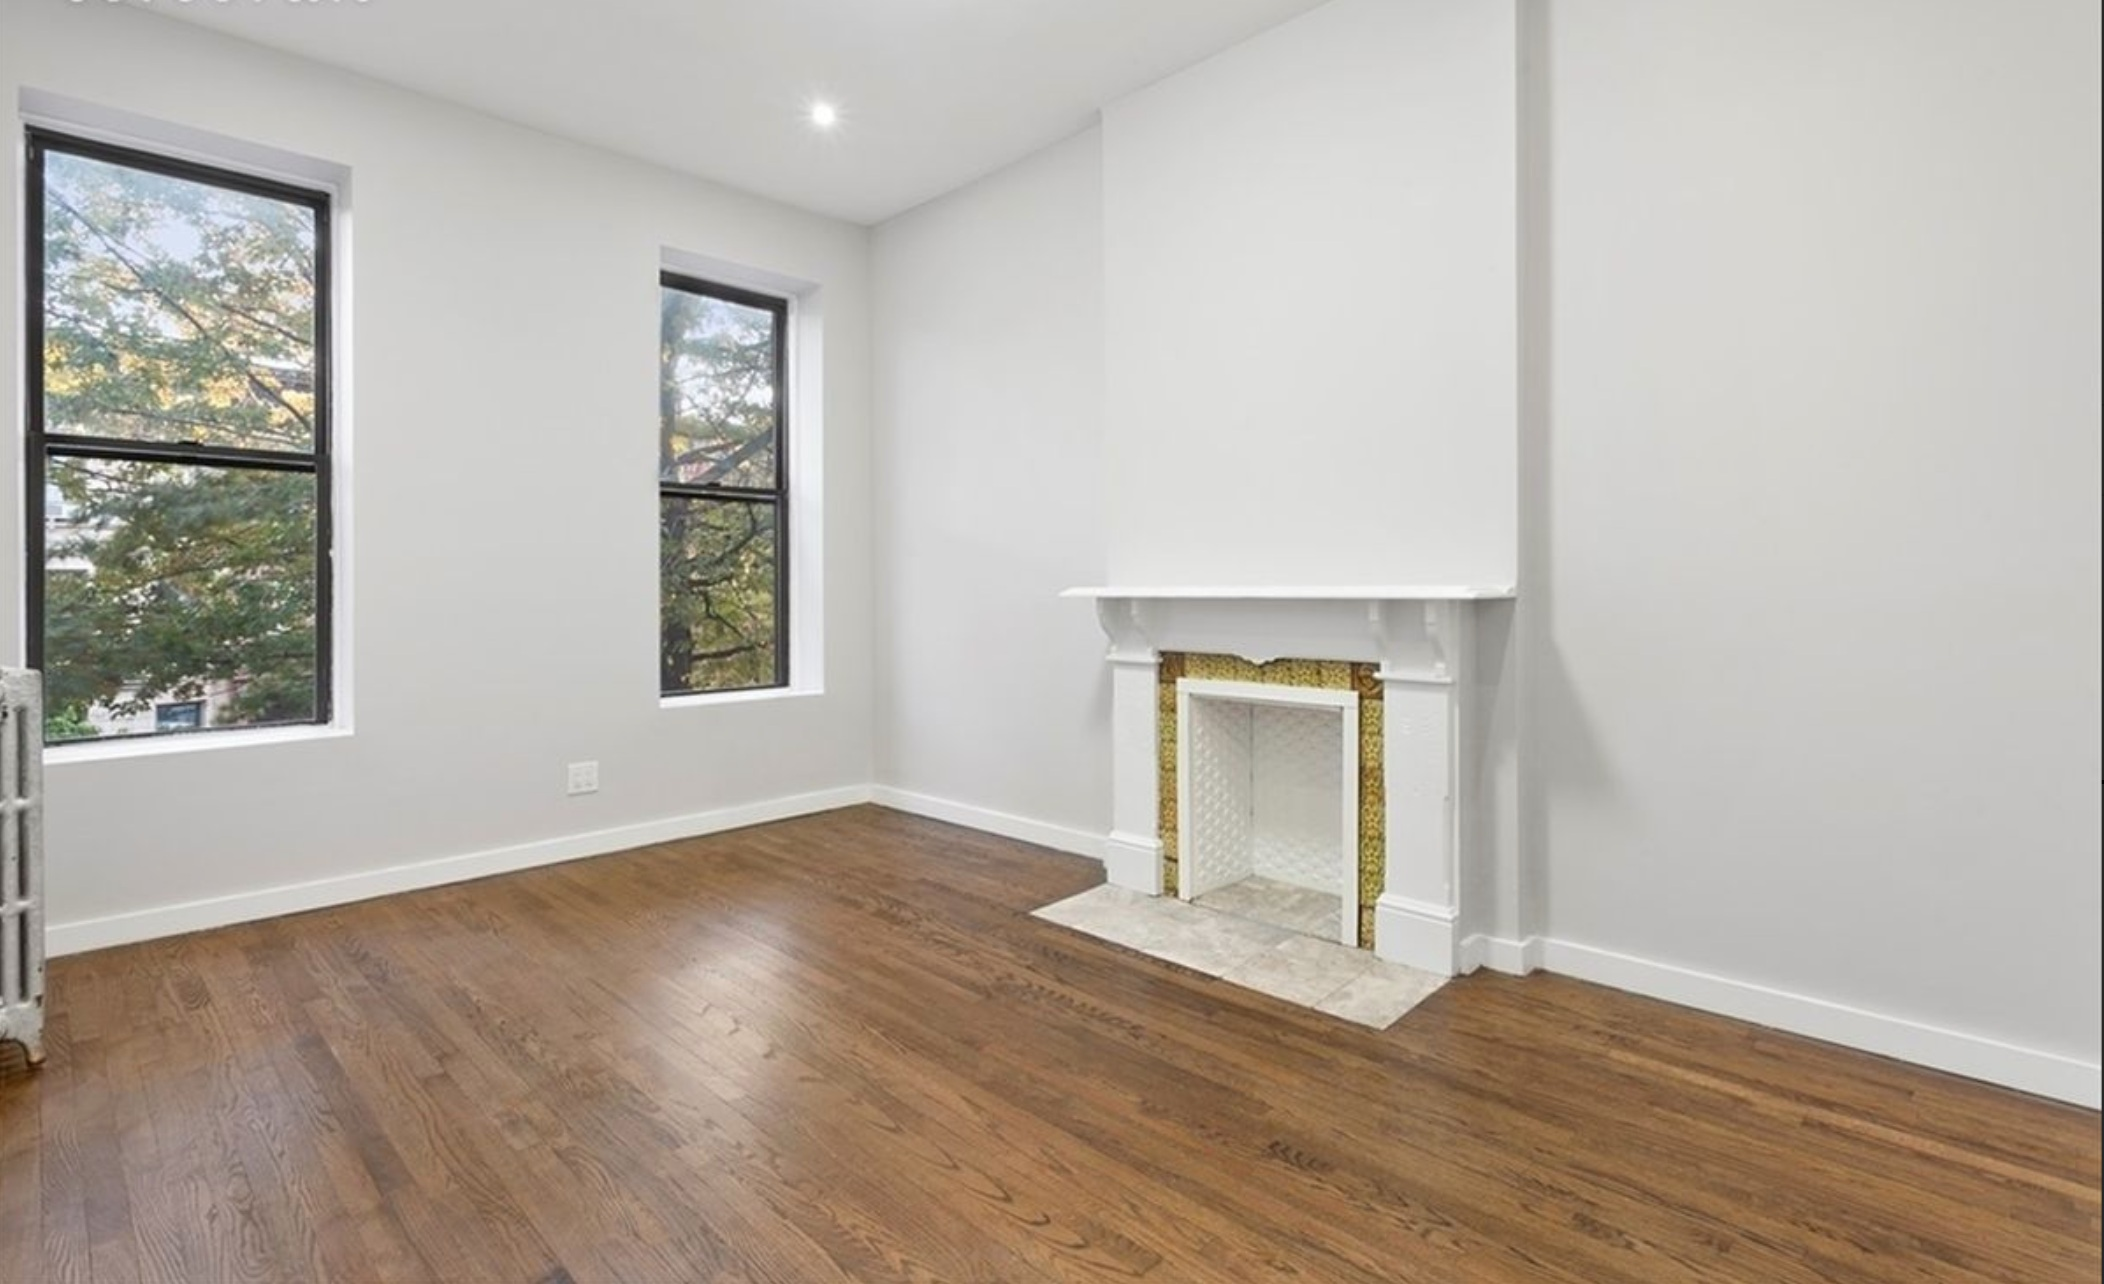 $2,100/month 1.0 BD | 1.0 BA  Bedford-Stuyvesant  211 Jefferson Avenue Apt. 4F